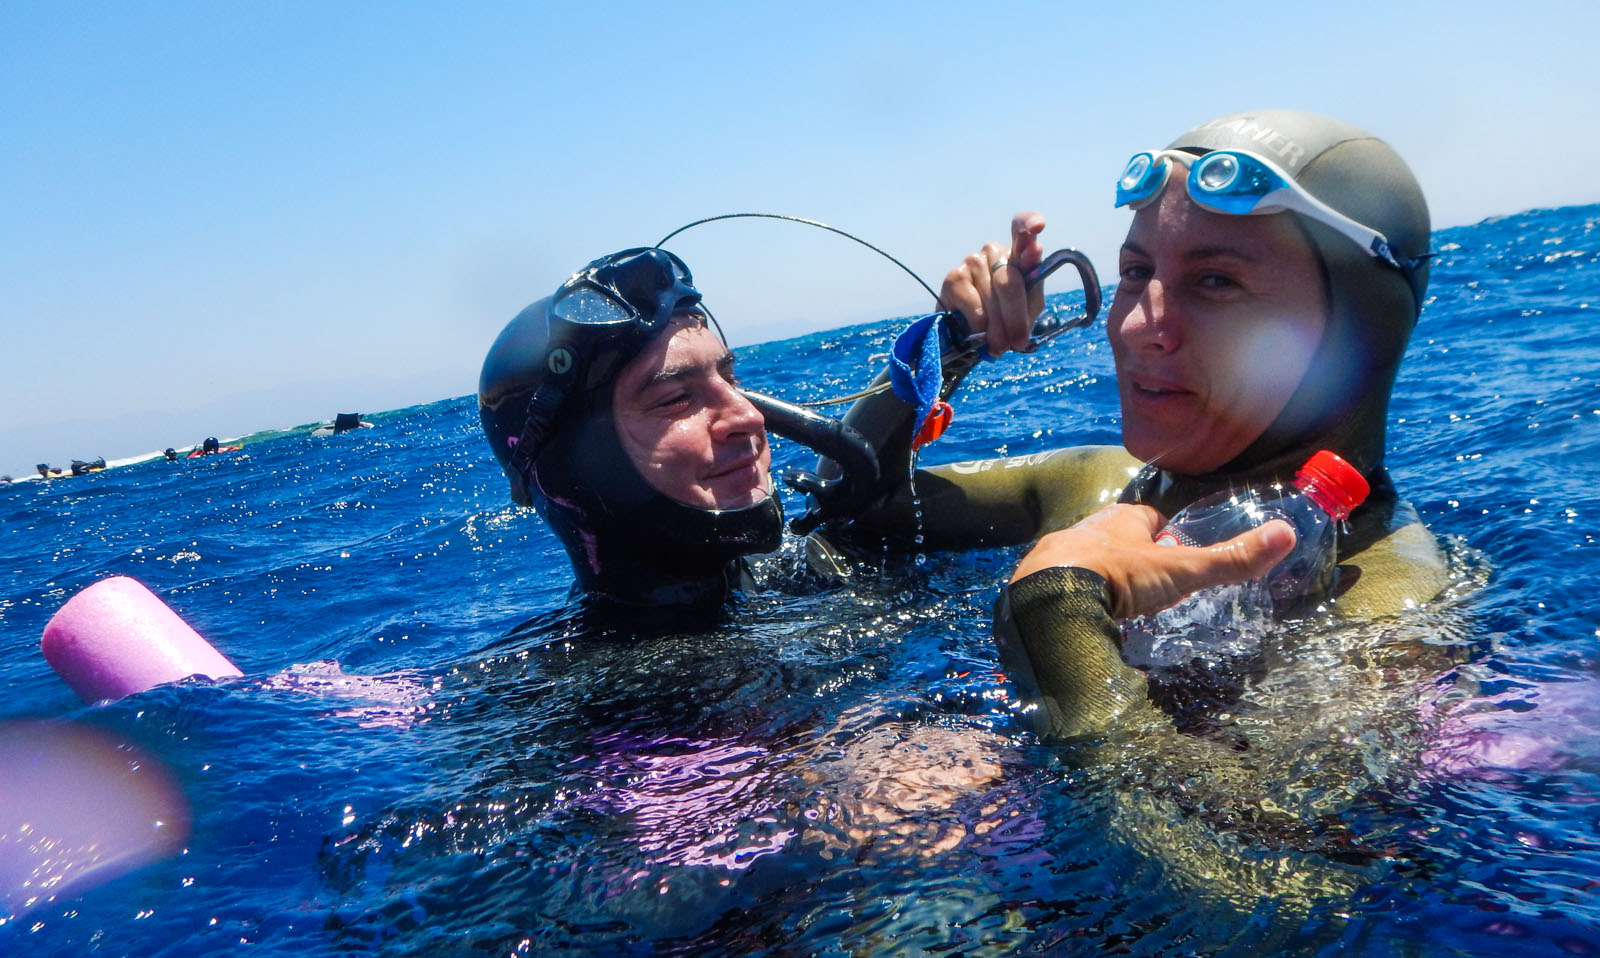 Renee Blundon - American Freediver